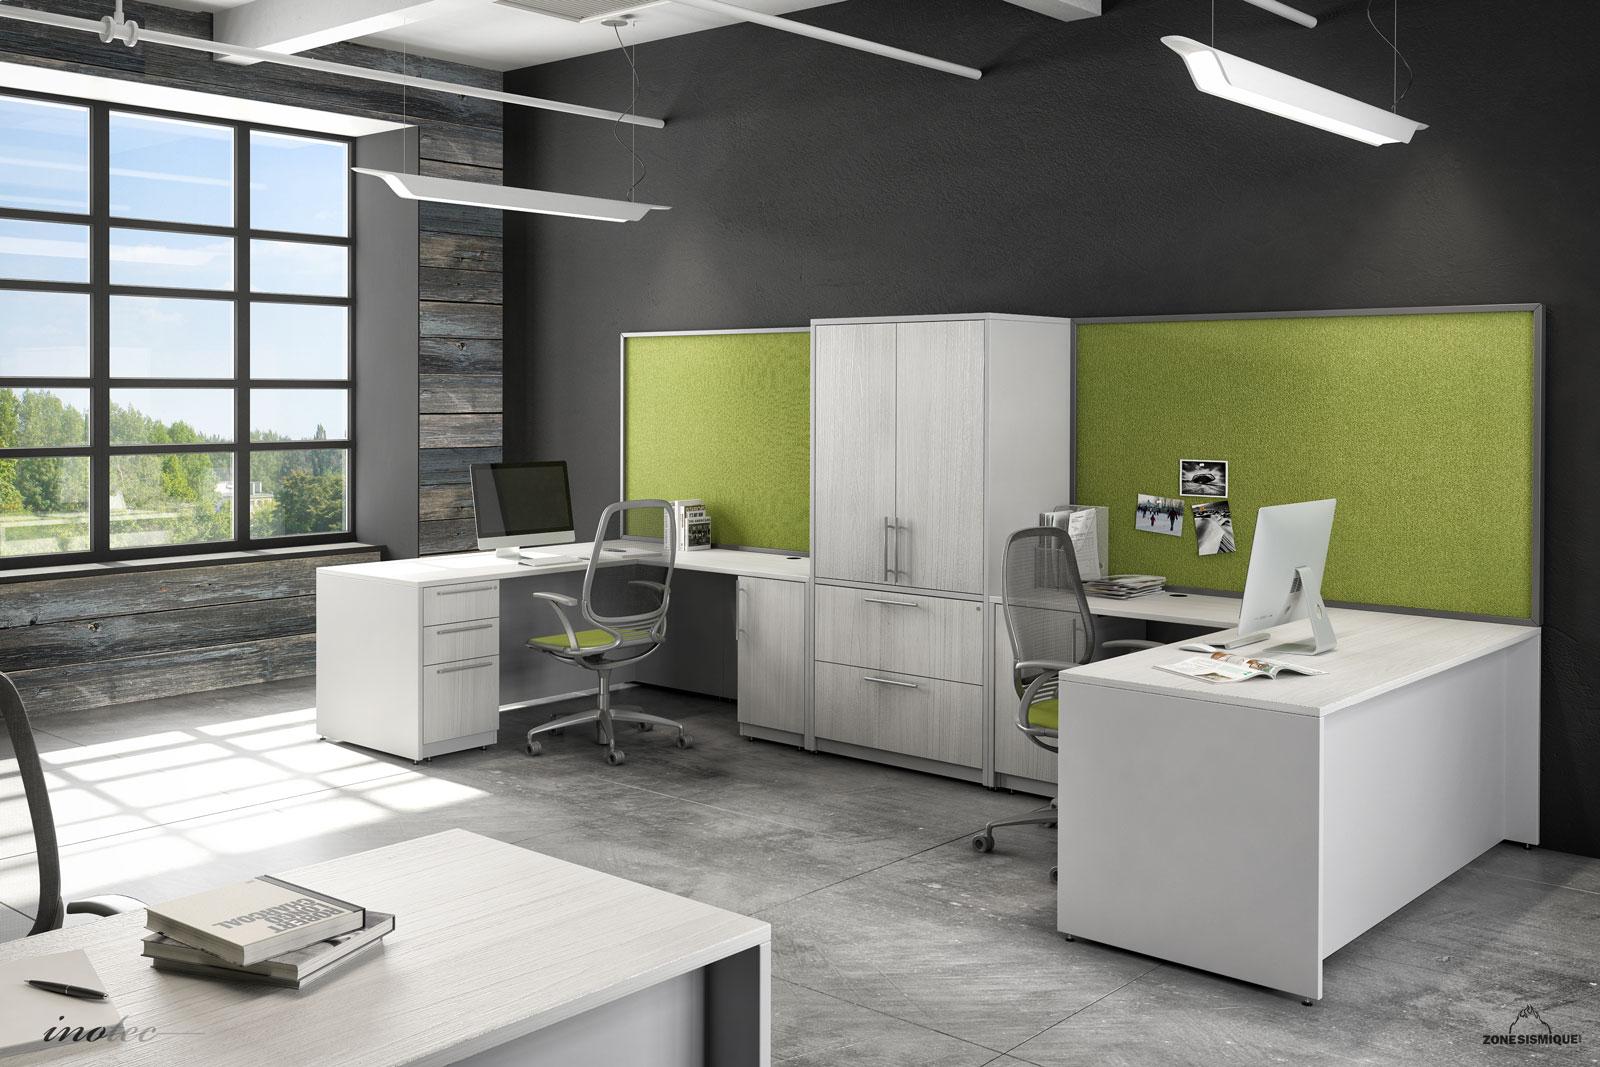 zone sismique inotec scene bureau 3d ypc 049 v1 zone sismique design industriel 3d. Black Bedroom Furniture Sets. Home Design Ideas